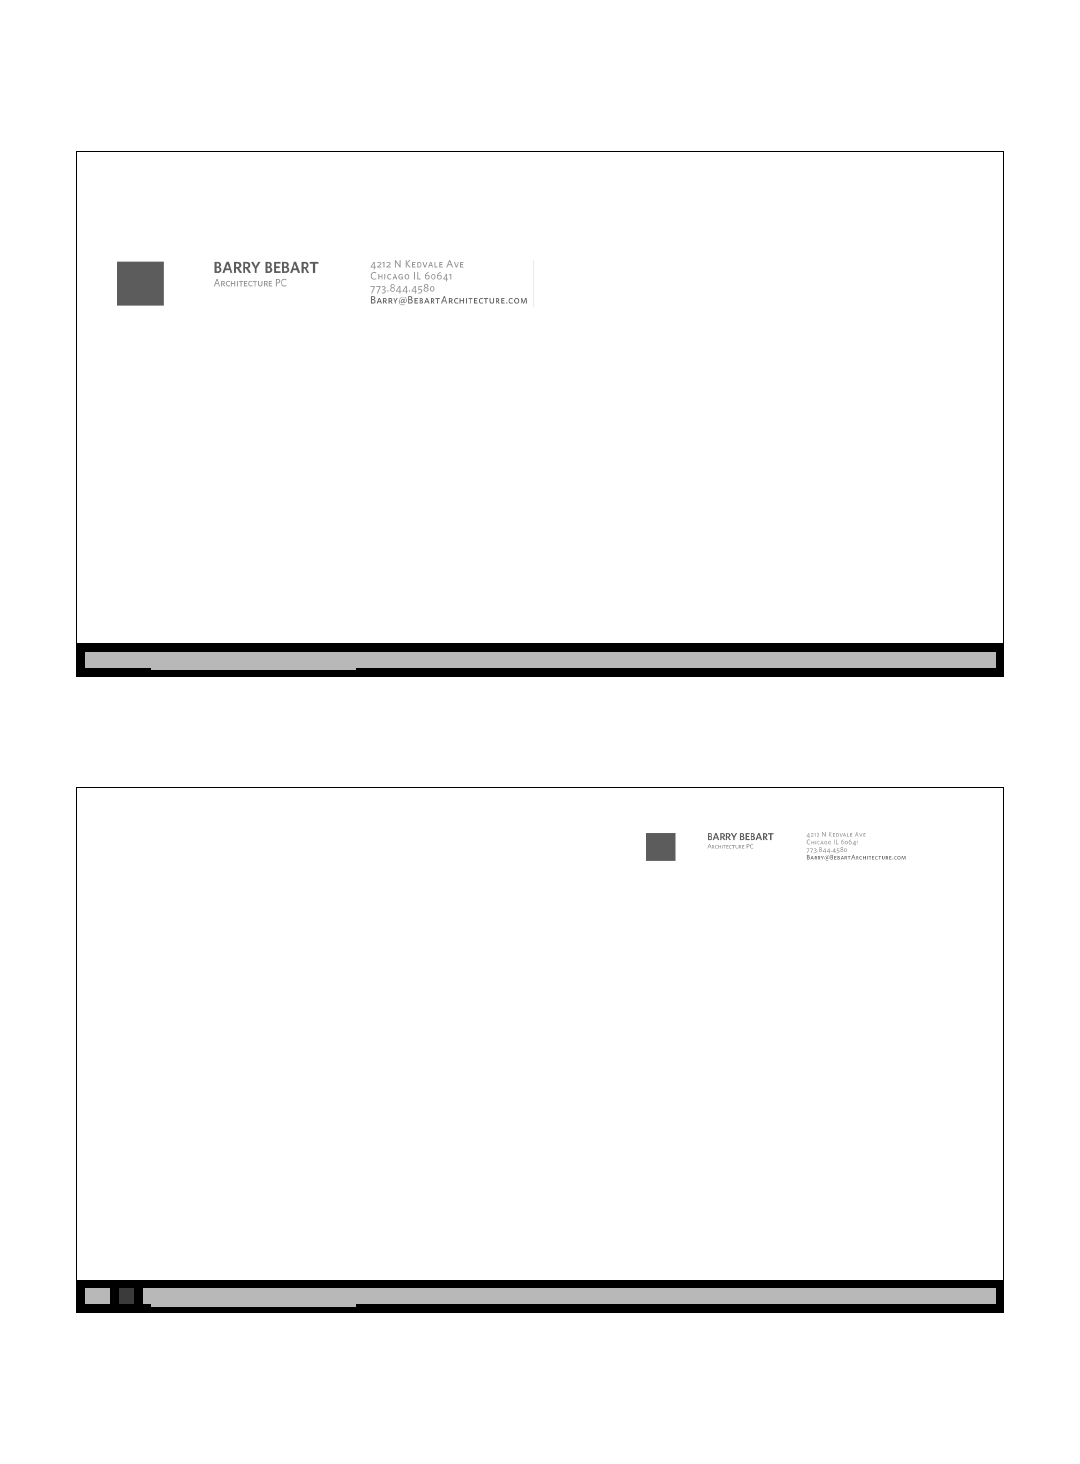 Boma 2010 Spreadsheet Throughout Boma Ansi Standardsbebart  [Pdf Document] Boma 2010 Spreadsheet Printable Spreadshee Printable Spreadshee boma 2010 spreadsheet